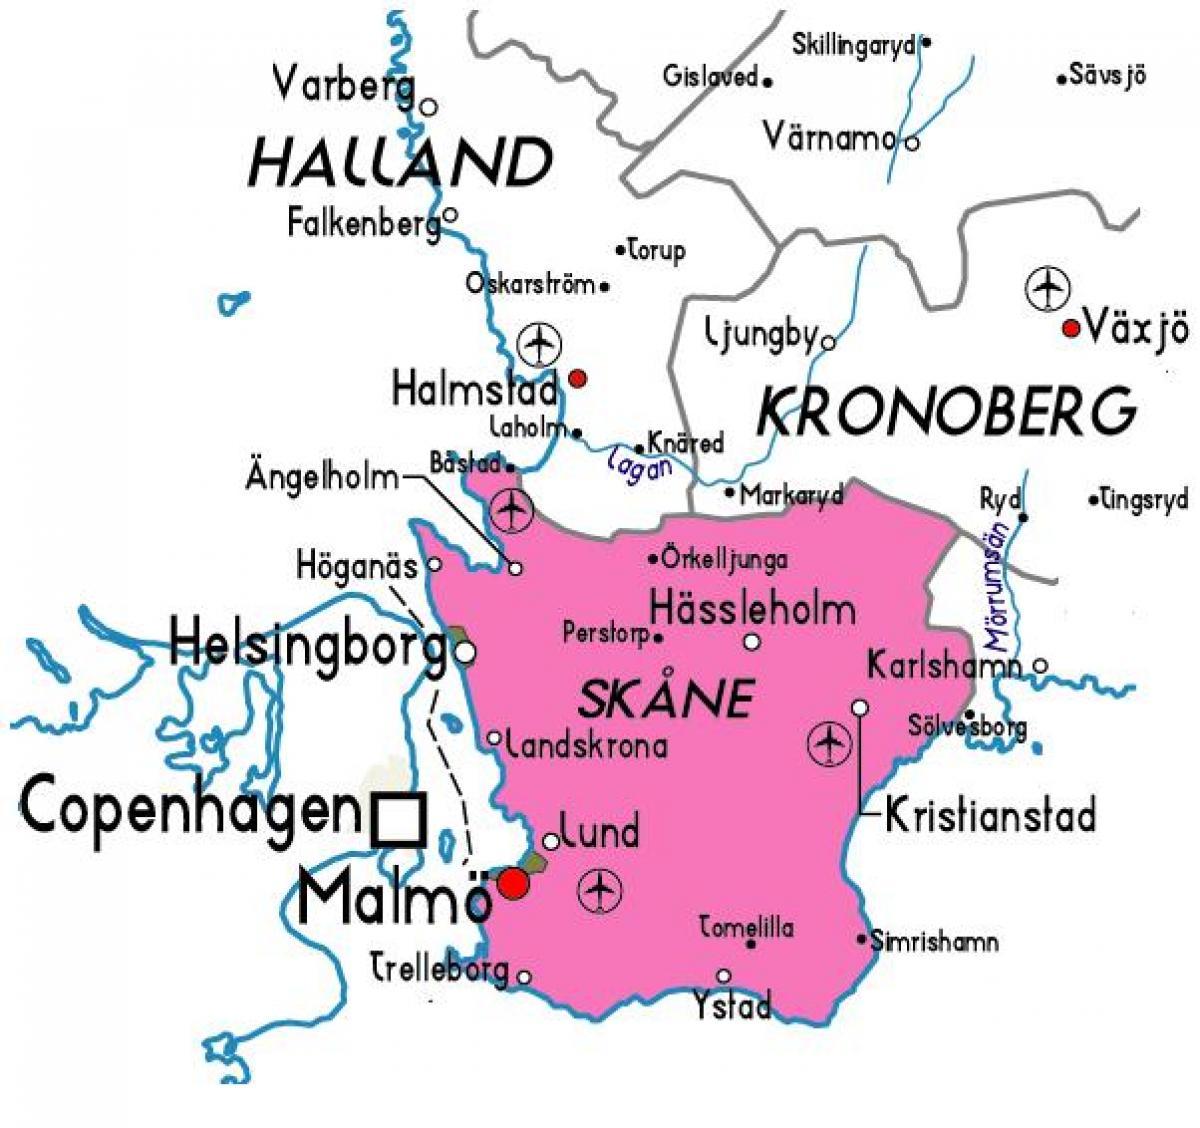 Skane Sweden Kort Kort Over Skane Sverige I Det Nordlige Europa